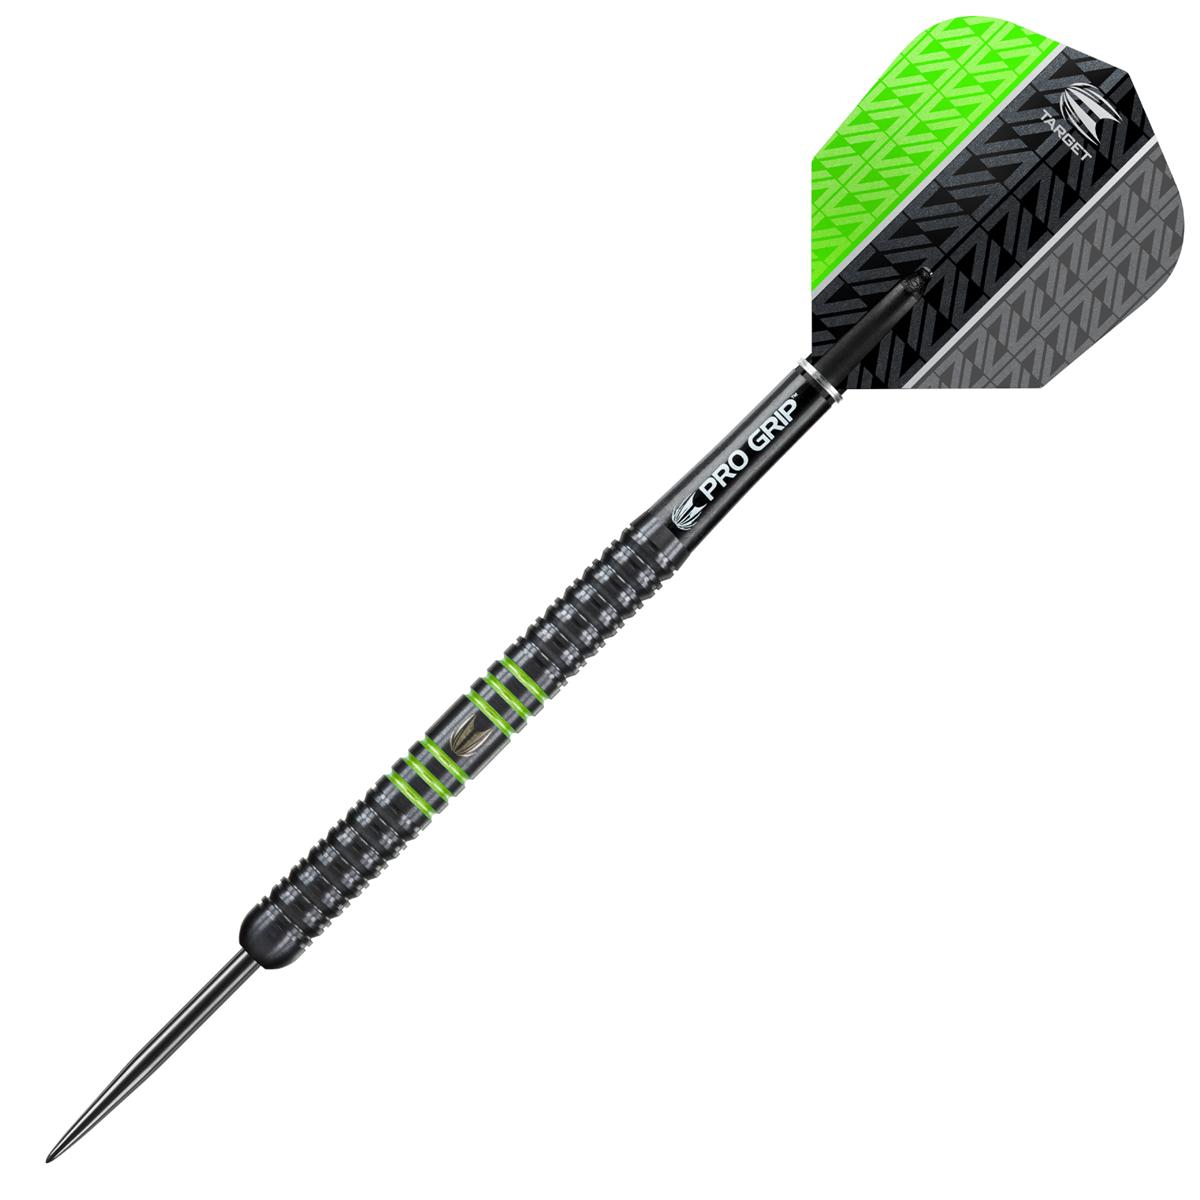 Target Darts Vapor8 Black/Green Steel 80% Tungsten 23 grams